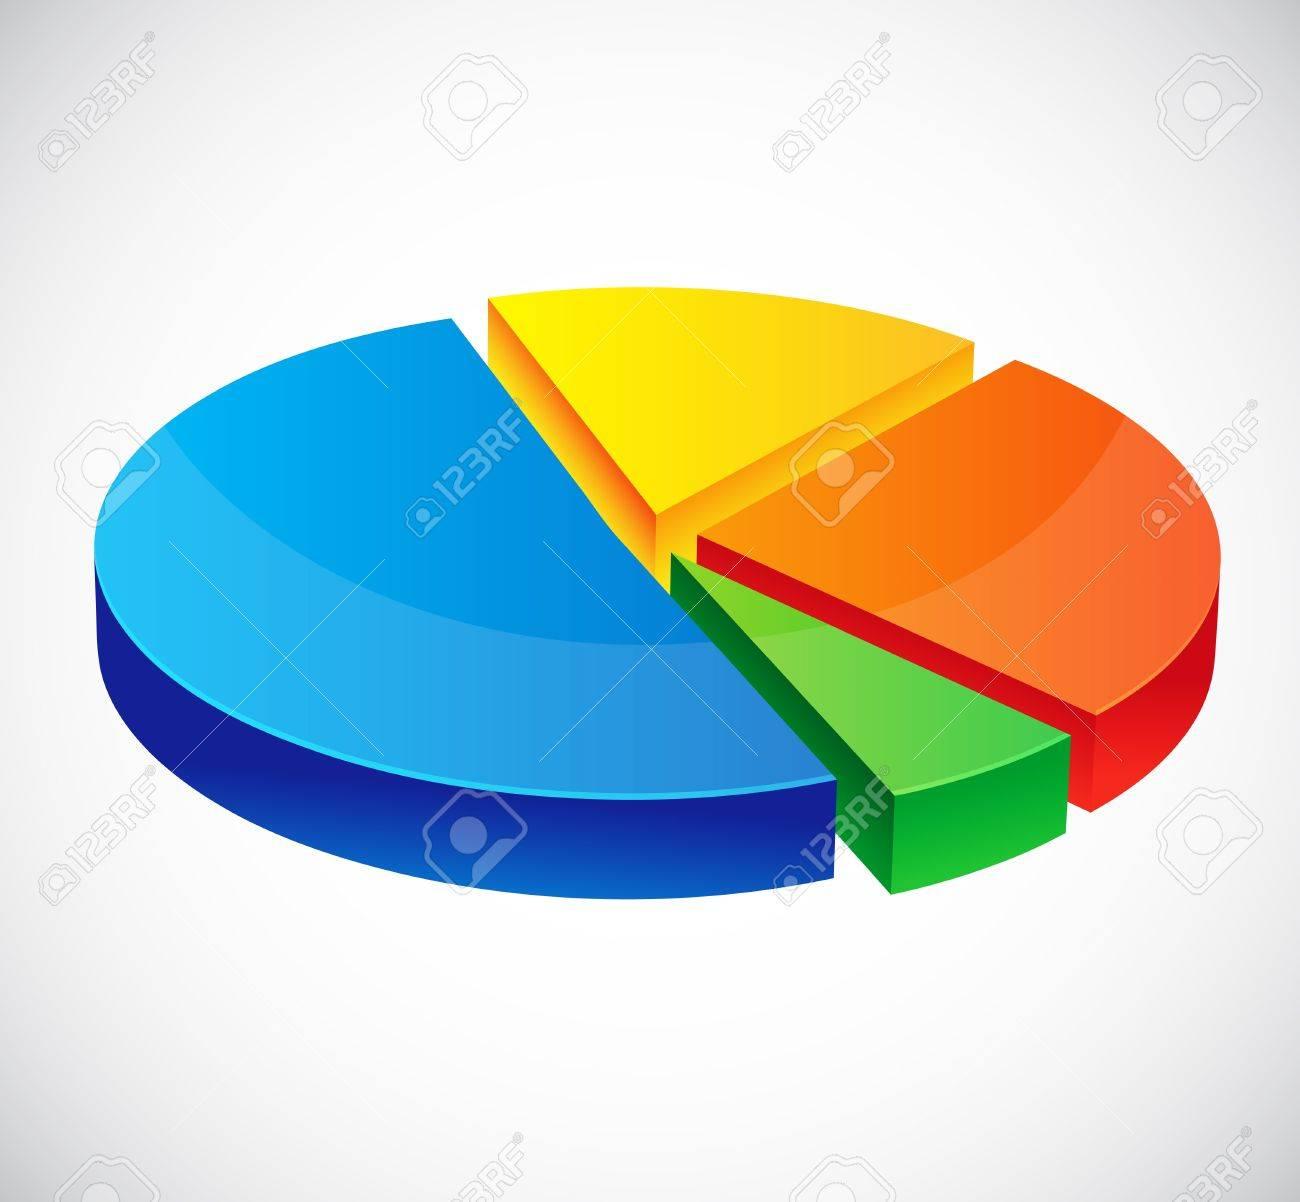 Circle diagram Stock Vector - 14799530